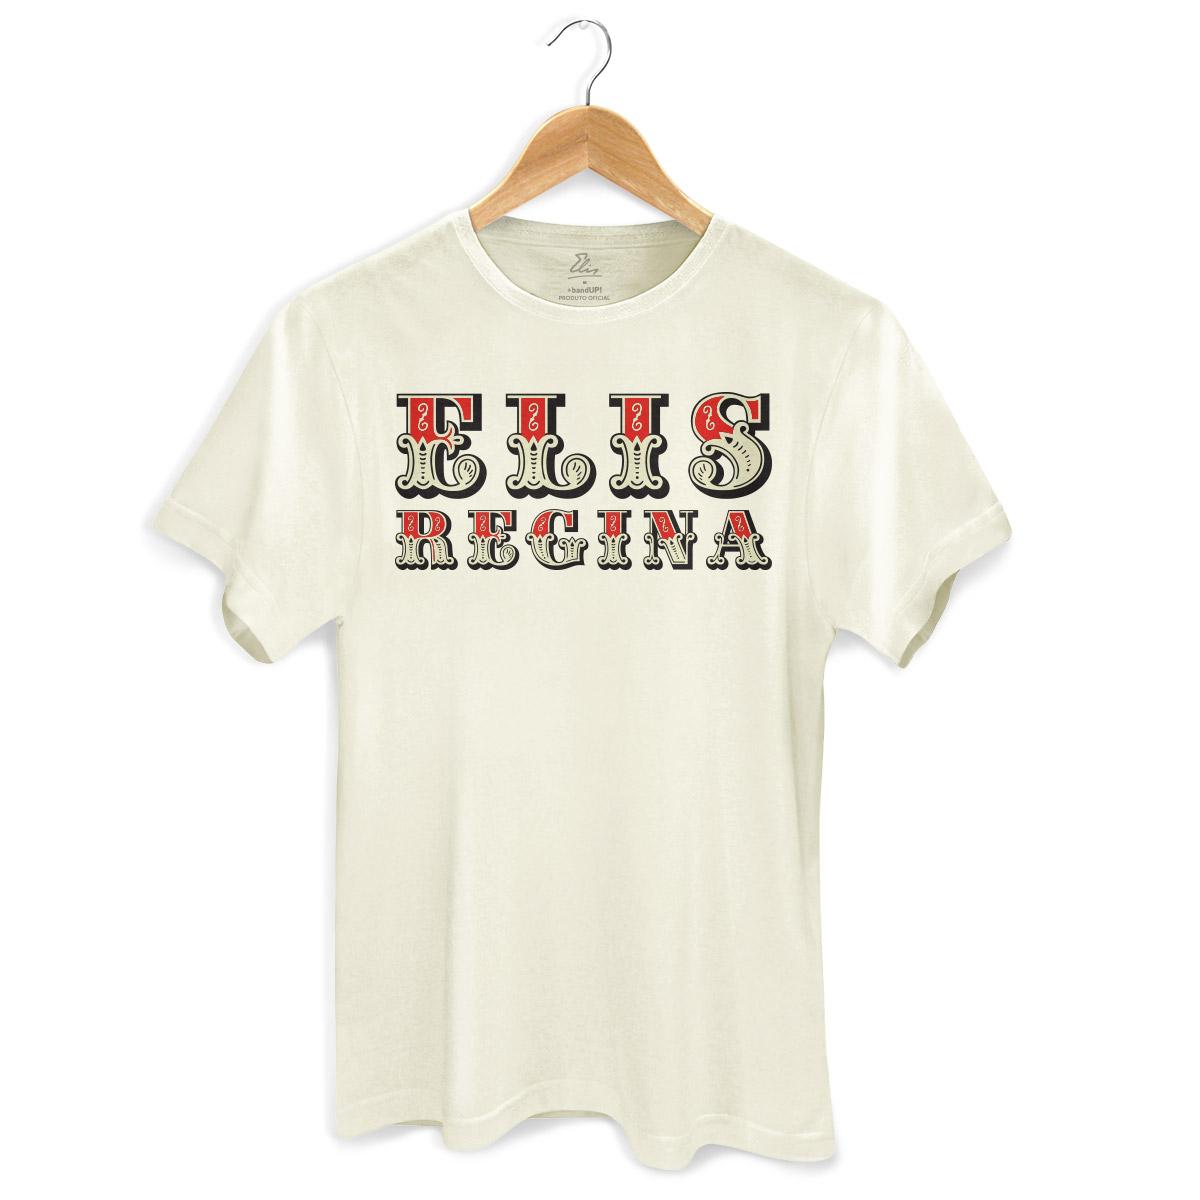 Camiseta Masculina Elis Regina Falso Brilhante